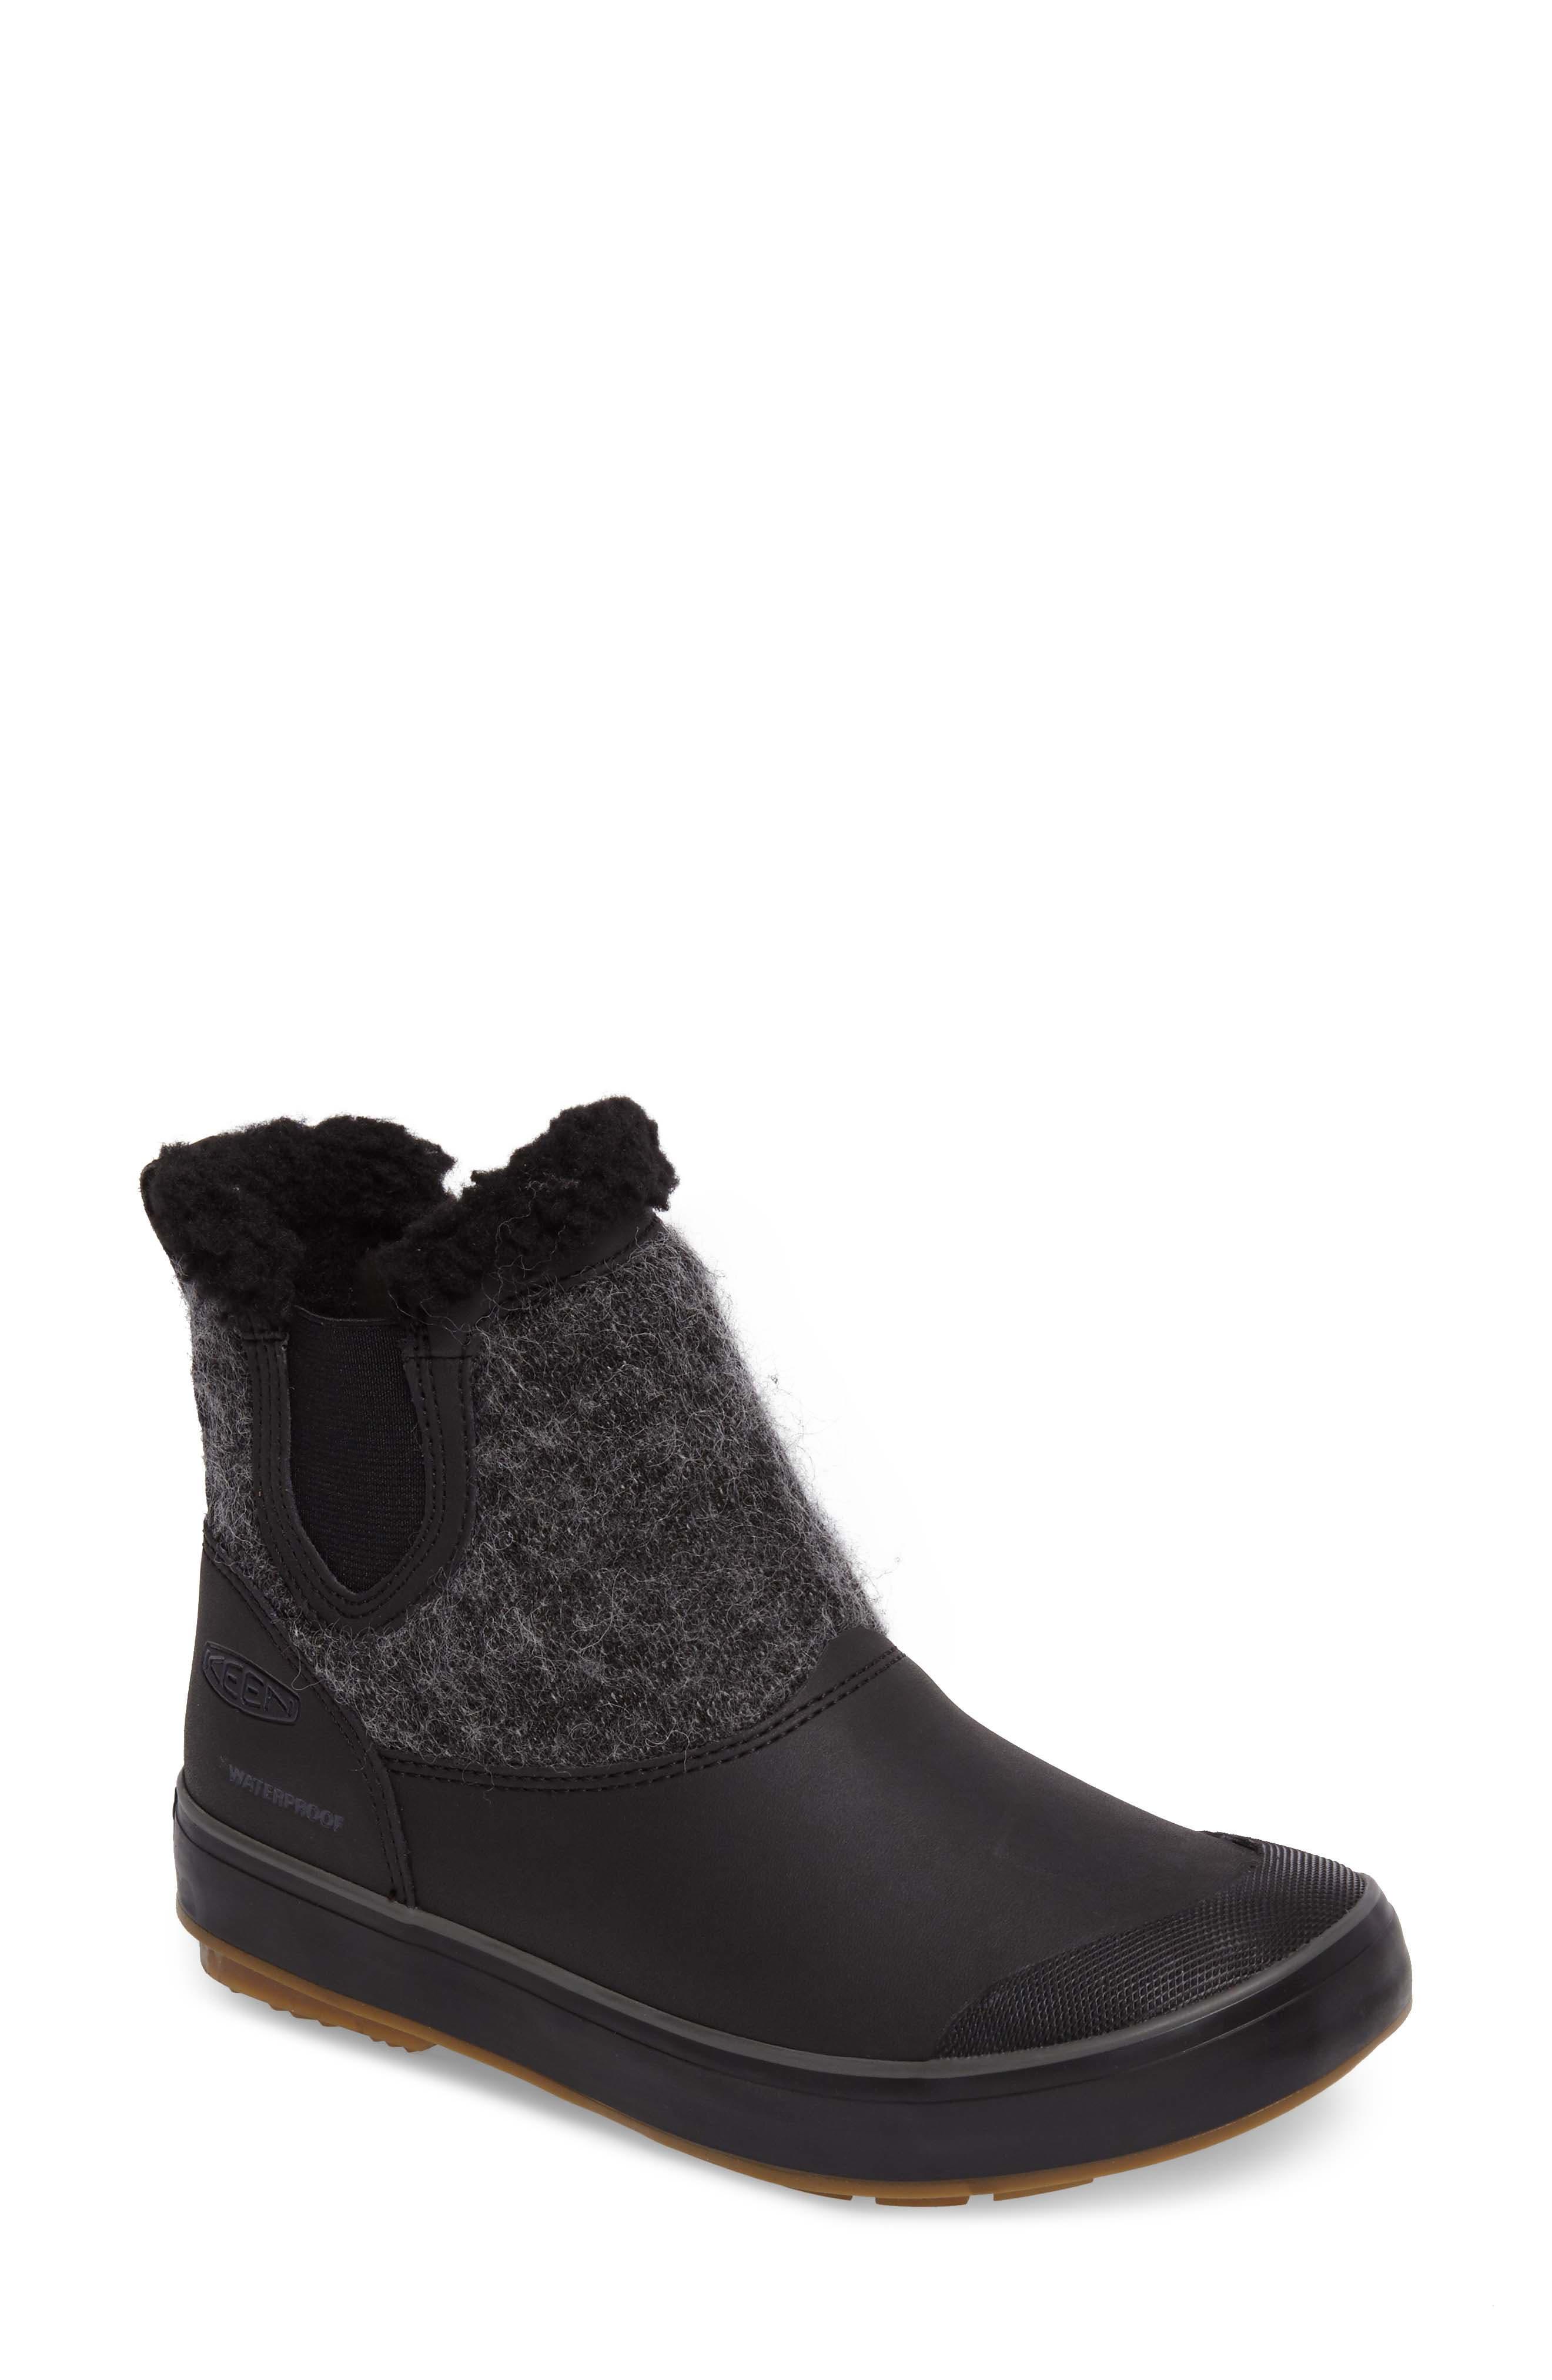 Elsa Chelsea Waterproof Faux Fur Lined Boot,                             Main thumbnail 1, color,                             Black Wool Leather